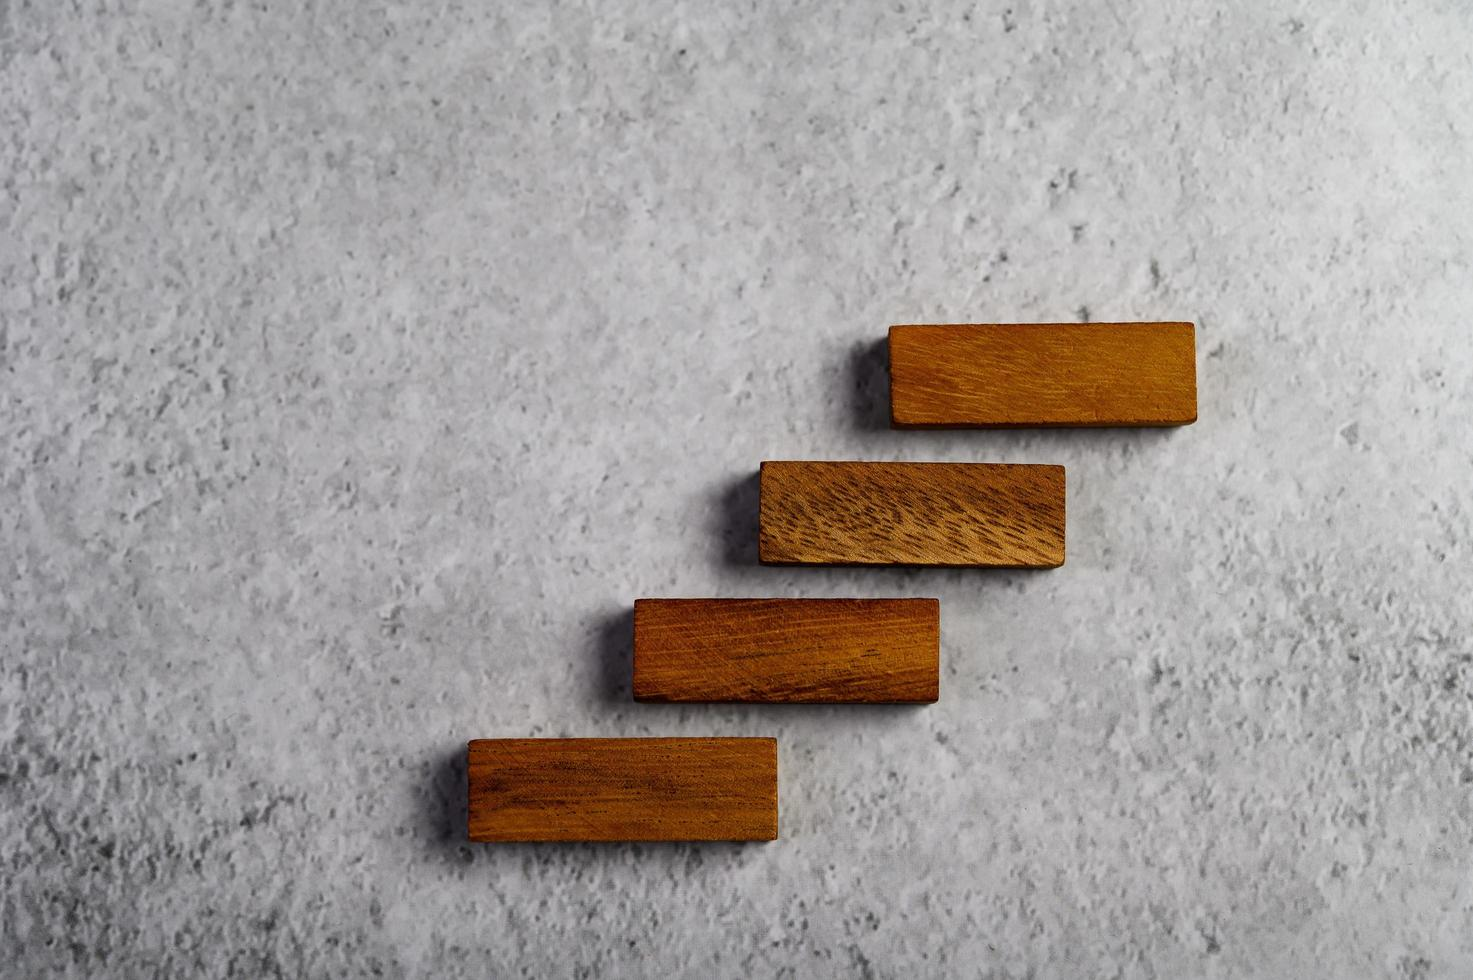 bloques de madera, utilizados para juegos de dominó foto